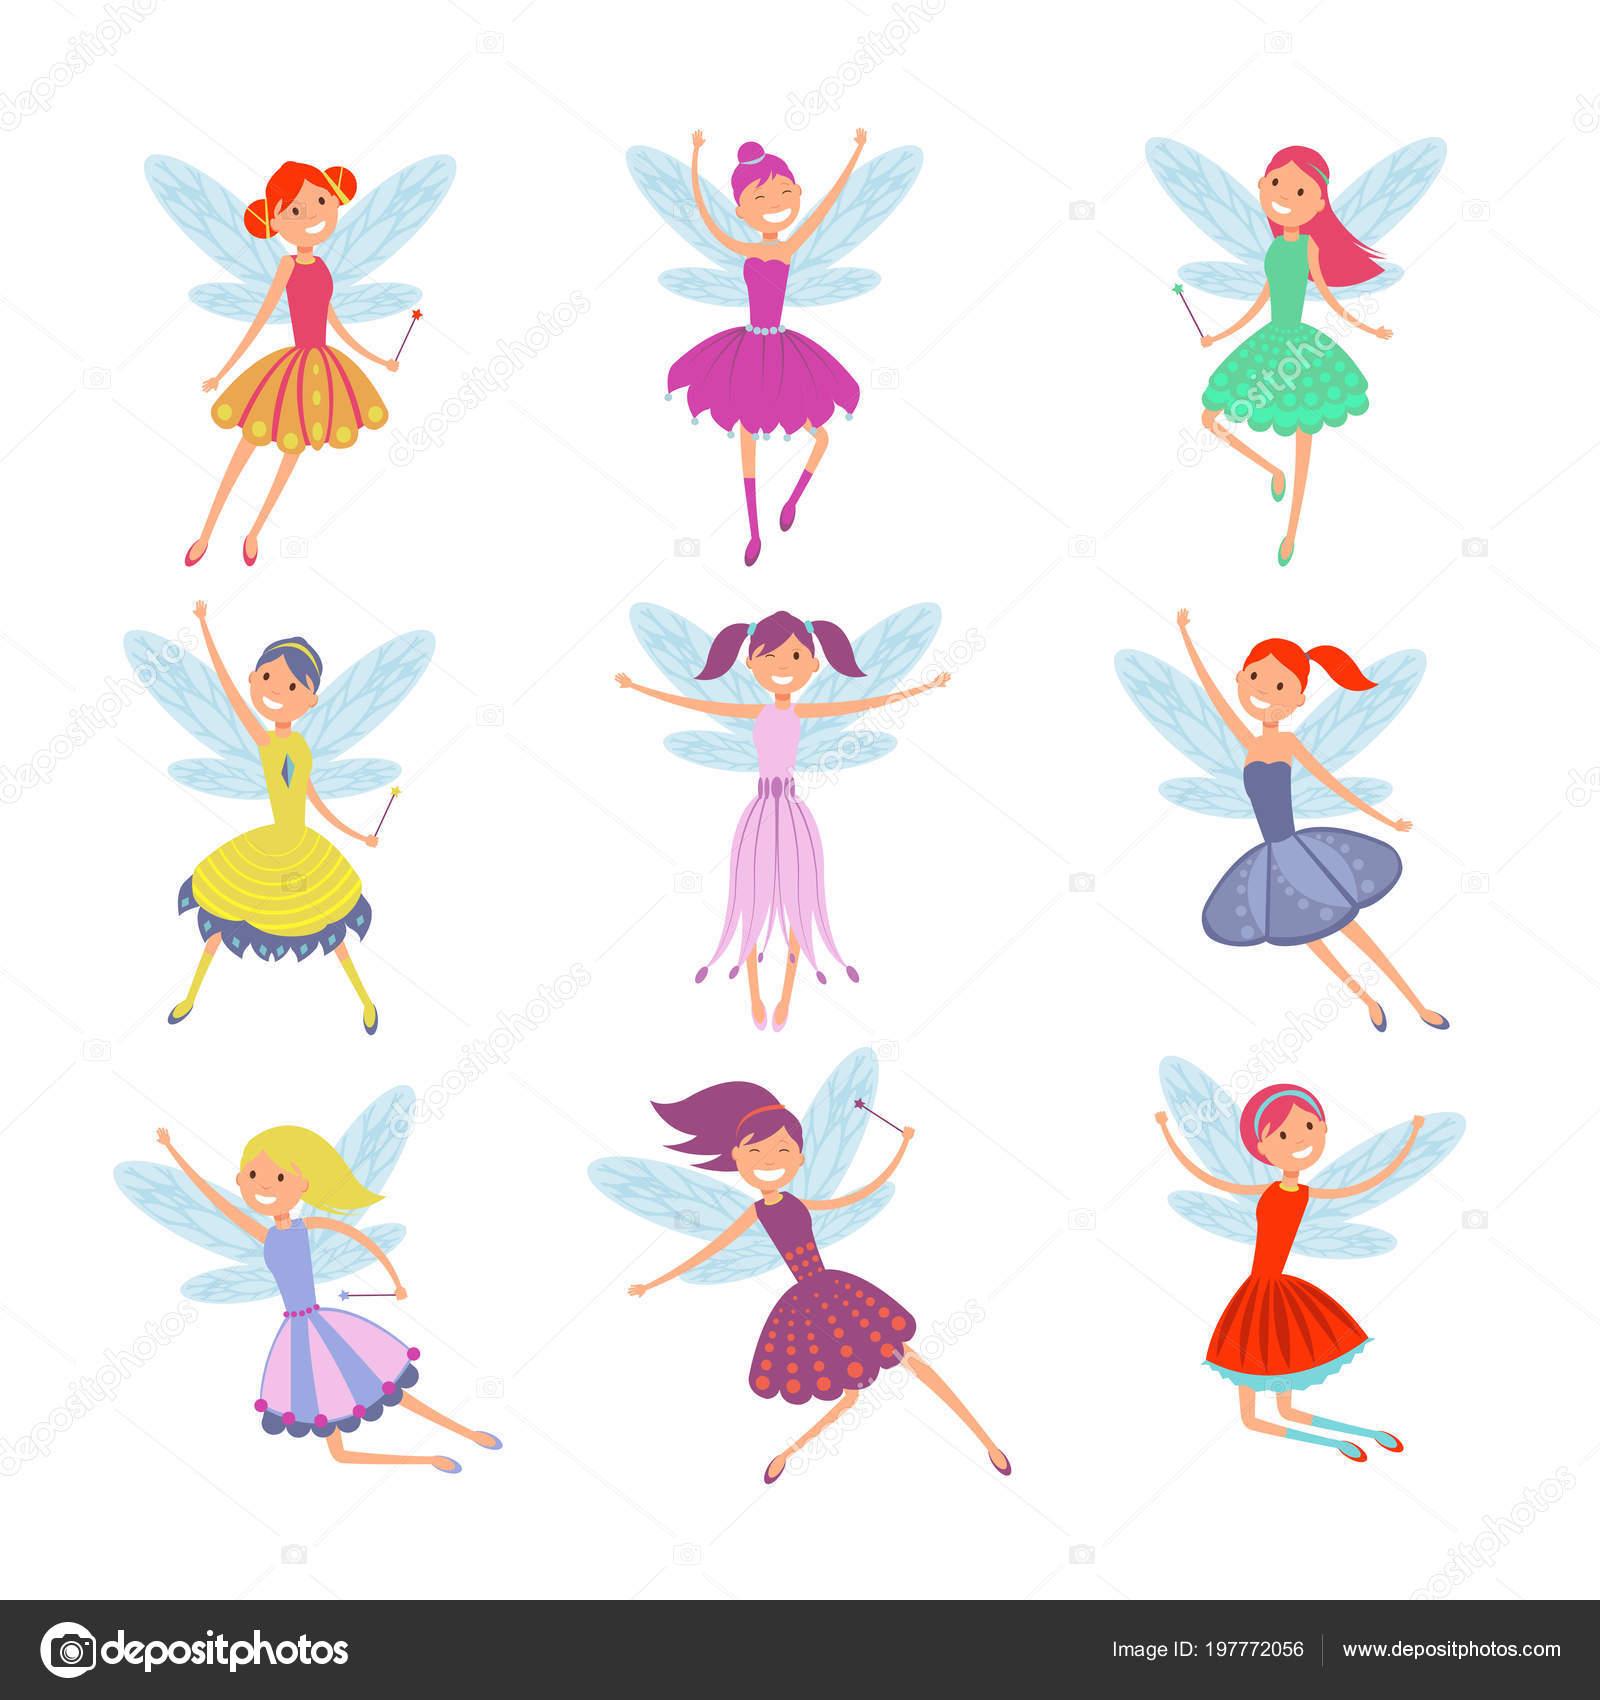 3fa41a95284f Καρτούν ιπτάμενα νεράιδες σε πολύχρωμα φορέματα διάνυσμα σύνολο. Χαριτωμένο  νεράιδα elf με συλλογή διάνυσμα ανέμους. Το κορίτσι φαντασίας νεράιδα με  φτερά ...